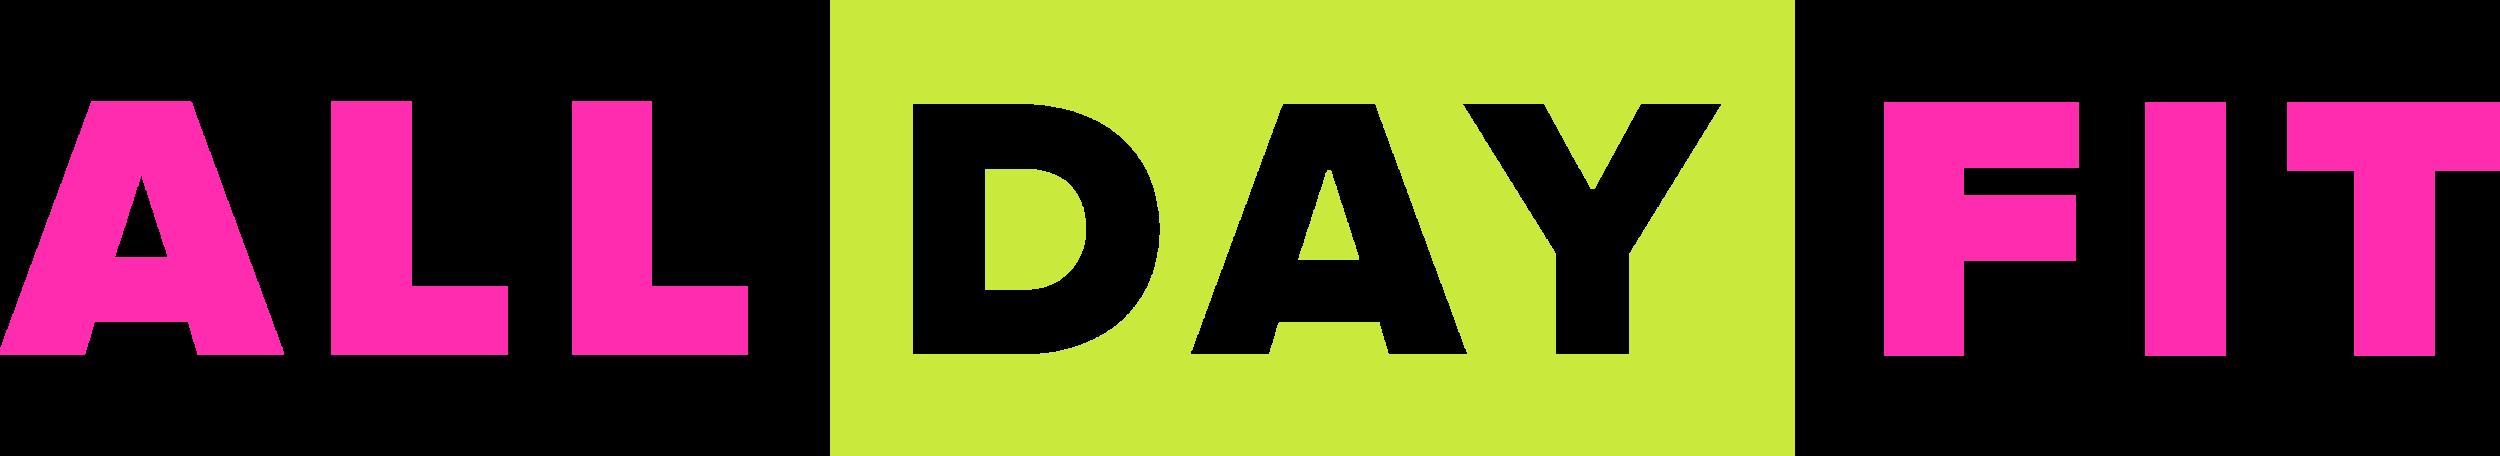 ALLDAYFIT-website-nav-logo-stacked-05.png